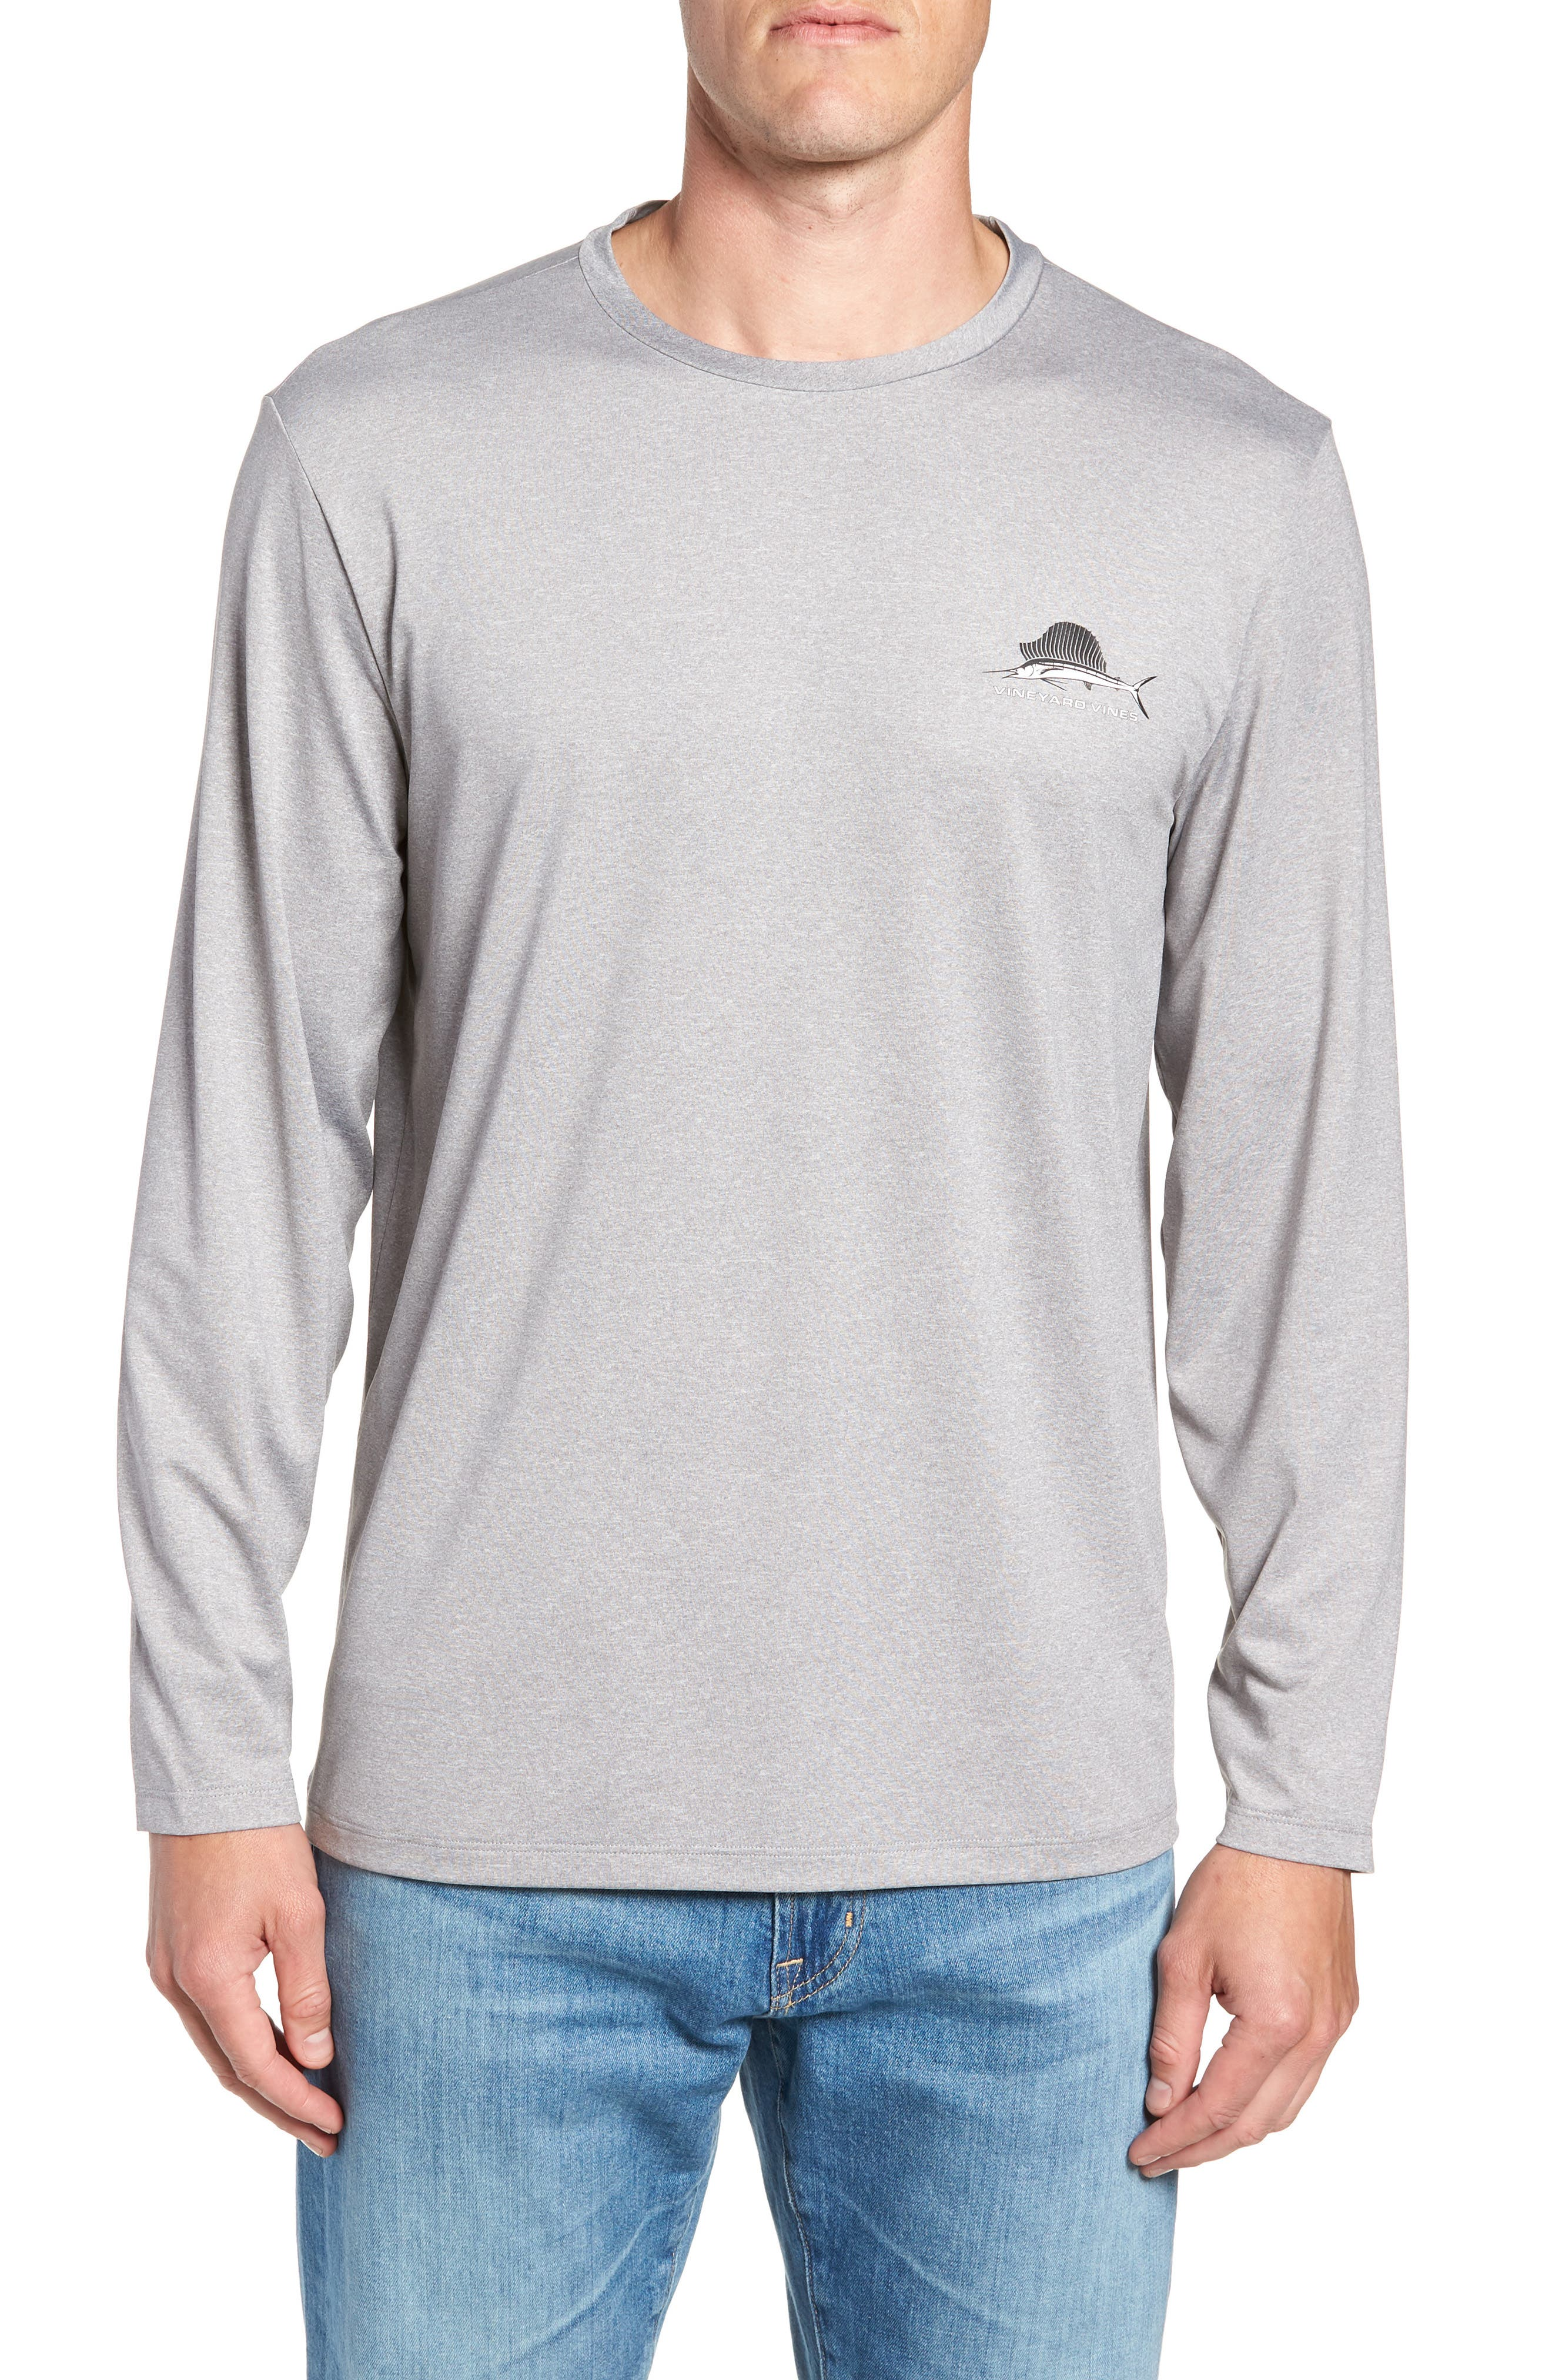 Sailfish Logo Performance T-Shirt,                         Main,                         color, Grey Heather